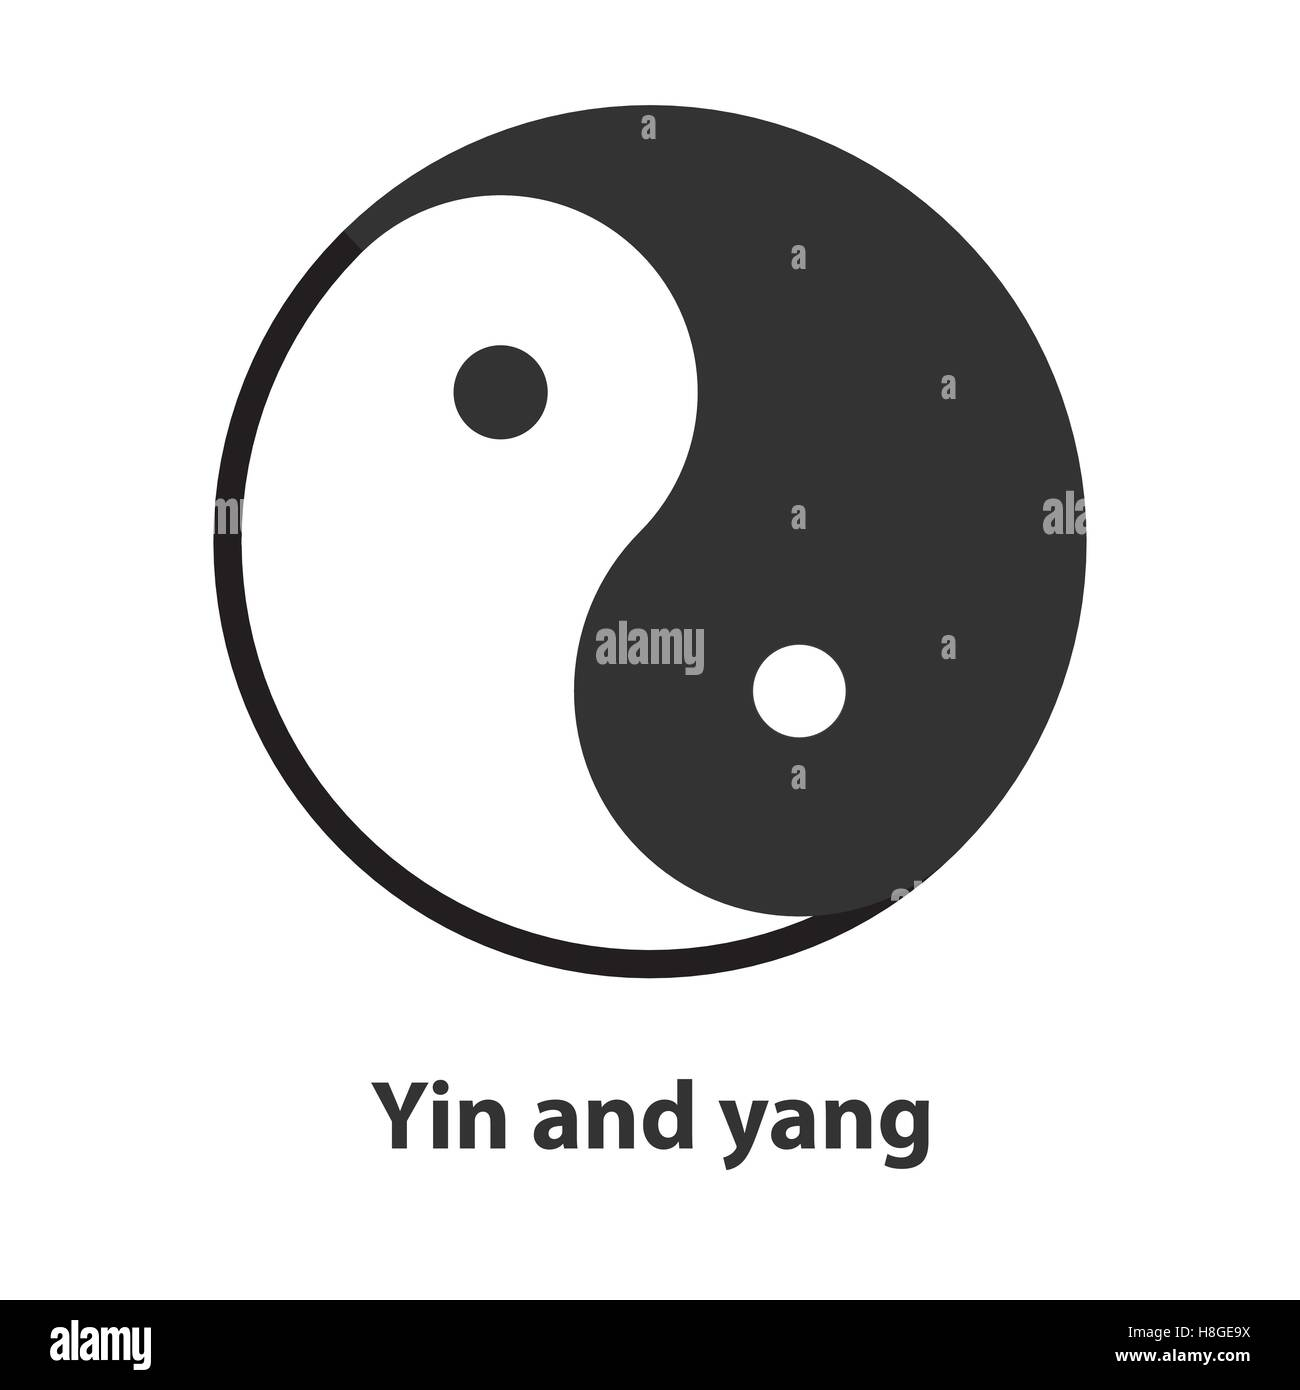 Icon of yin yang symbol taoism buddhism daoism religion sign icon of yin yang symbol taoism buddhism daoism religion sign buycottarizona Images